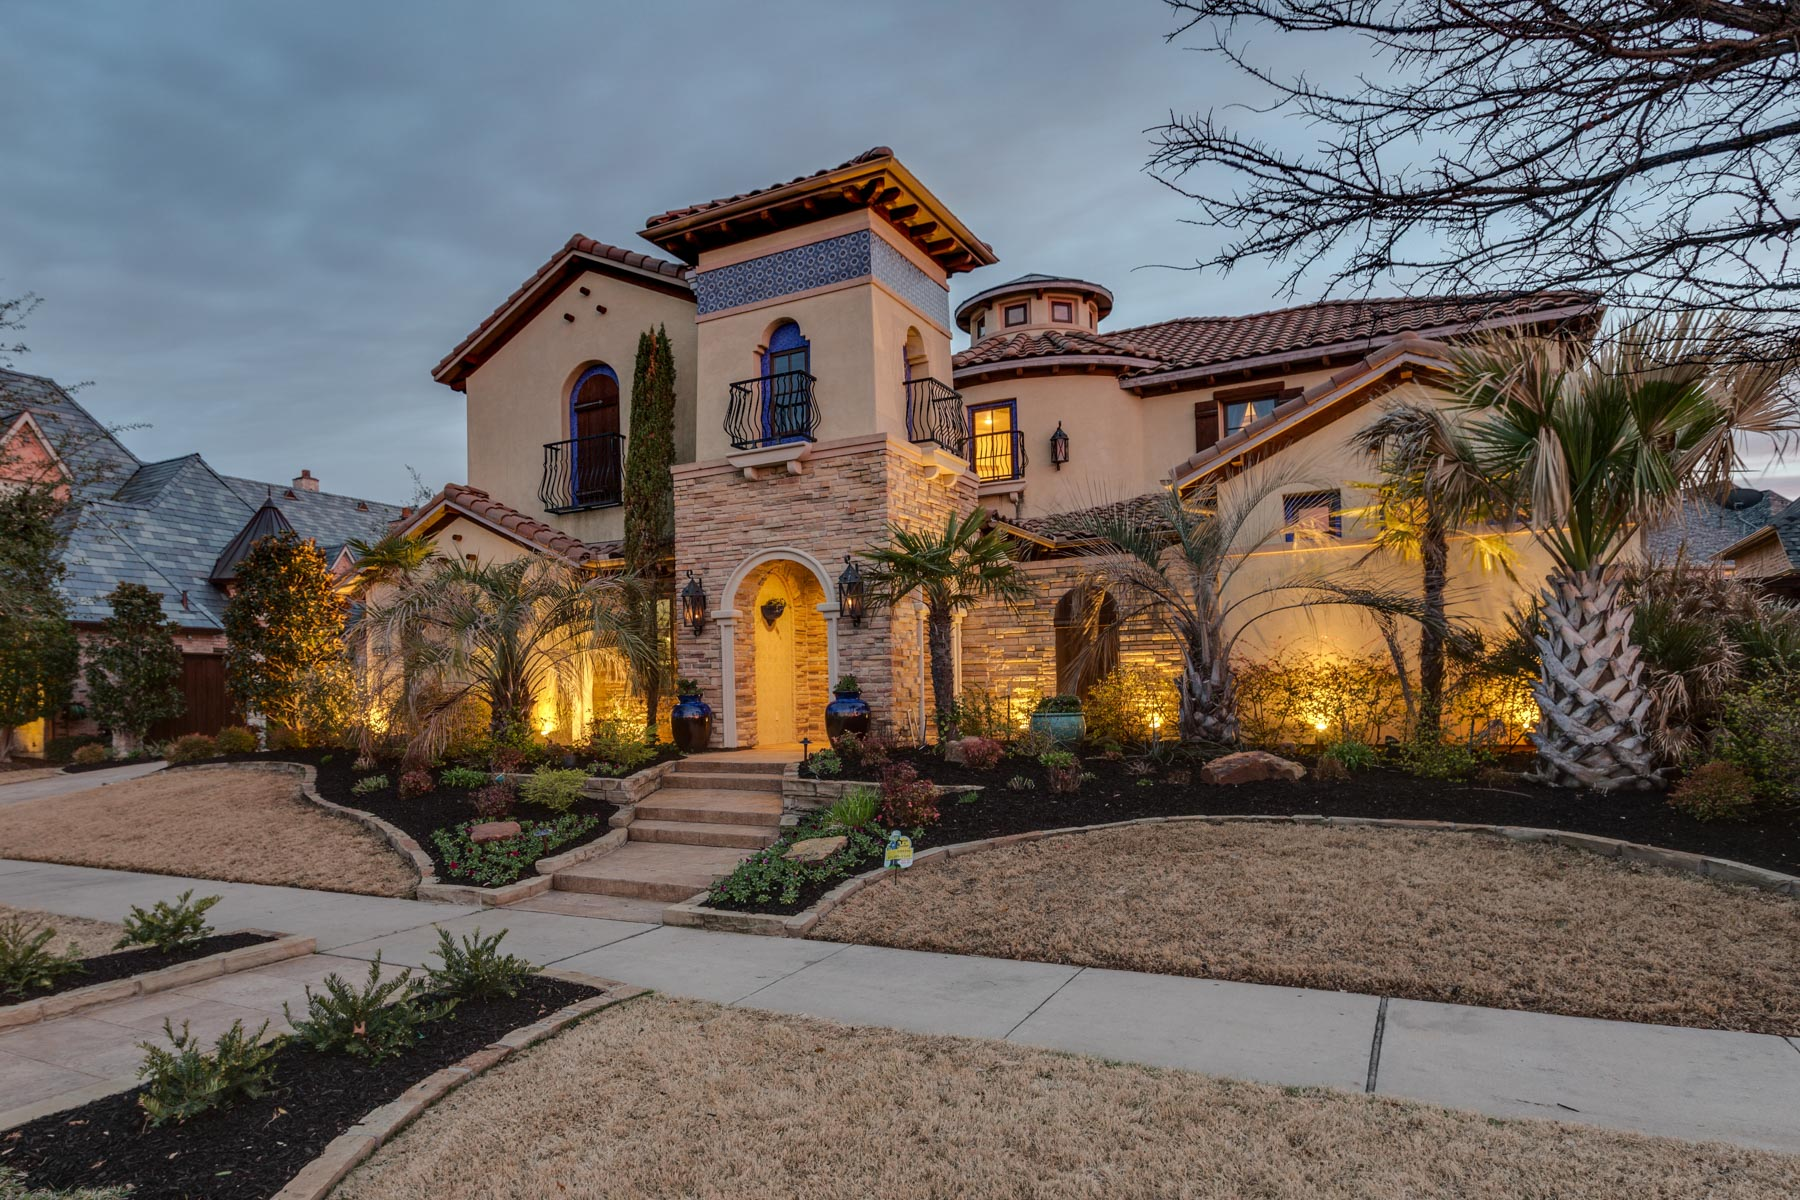 独户住宅 为 销售 在 Exclusive Spanish Style Home in Shaddock Creek Estates 4353 Cedar Bluff Lane, 弗里斯科, 得克萨斯州, 75033 美国